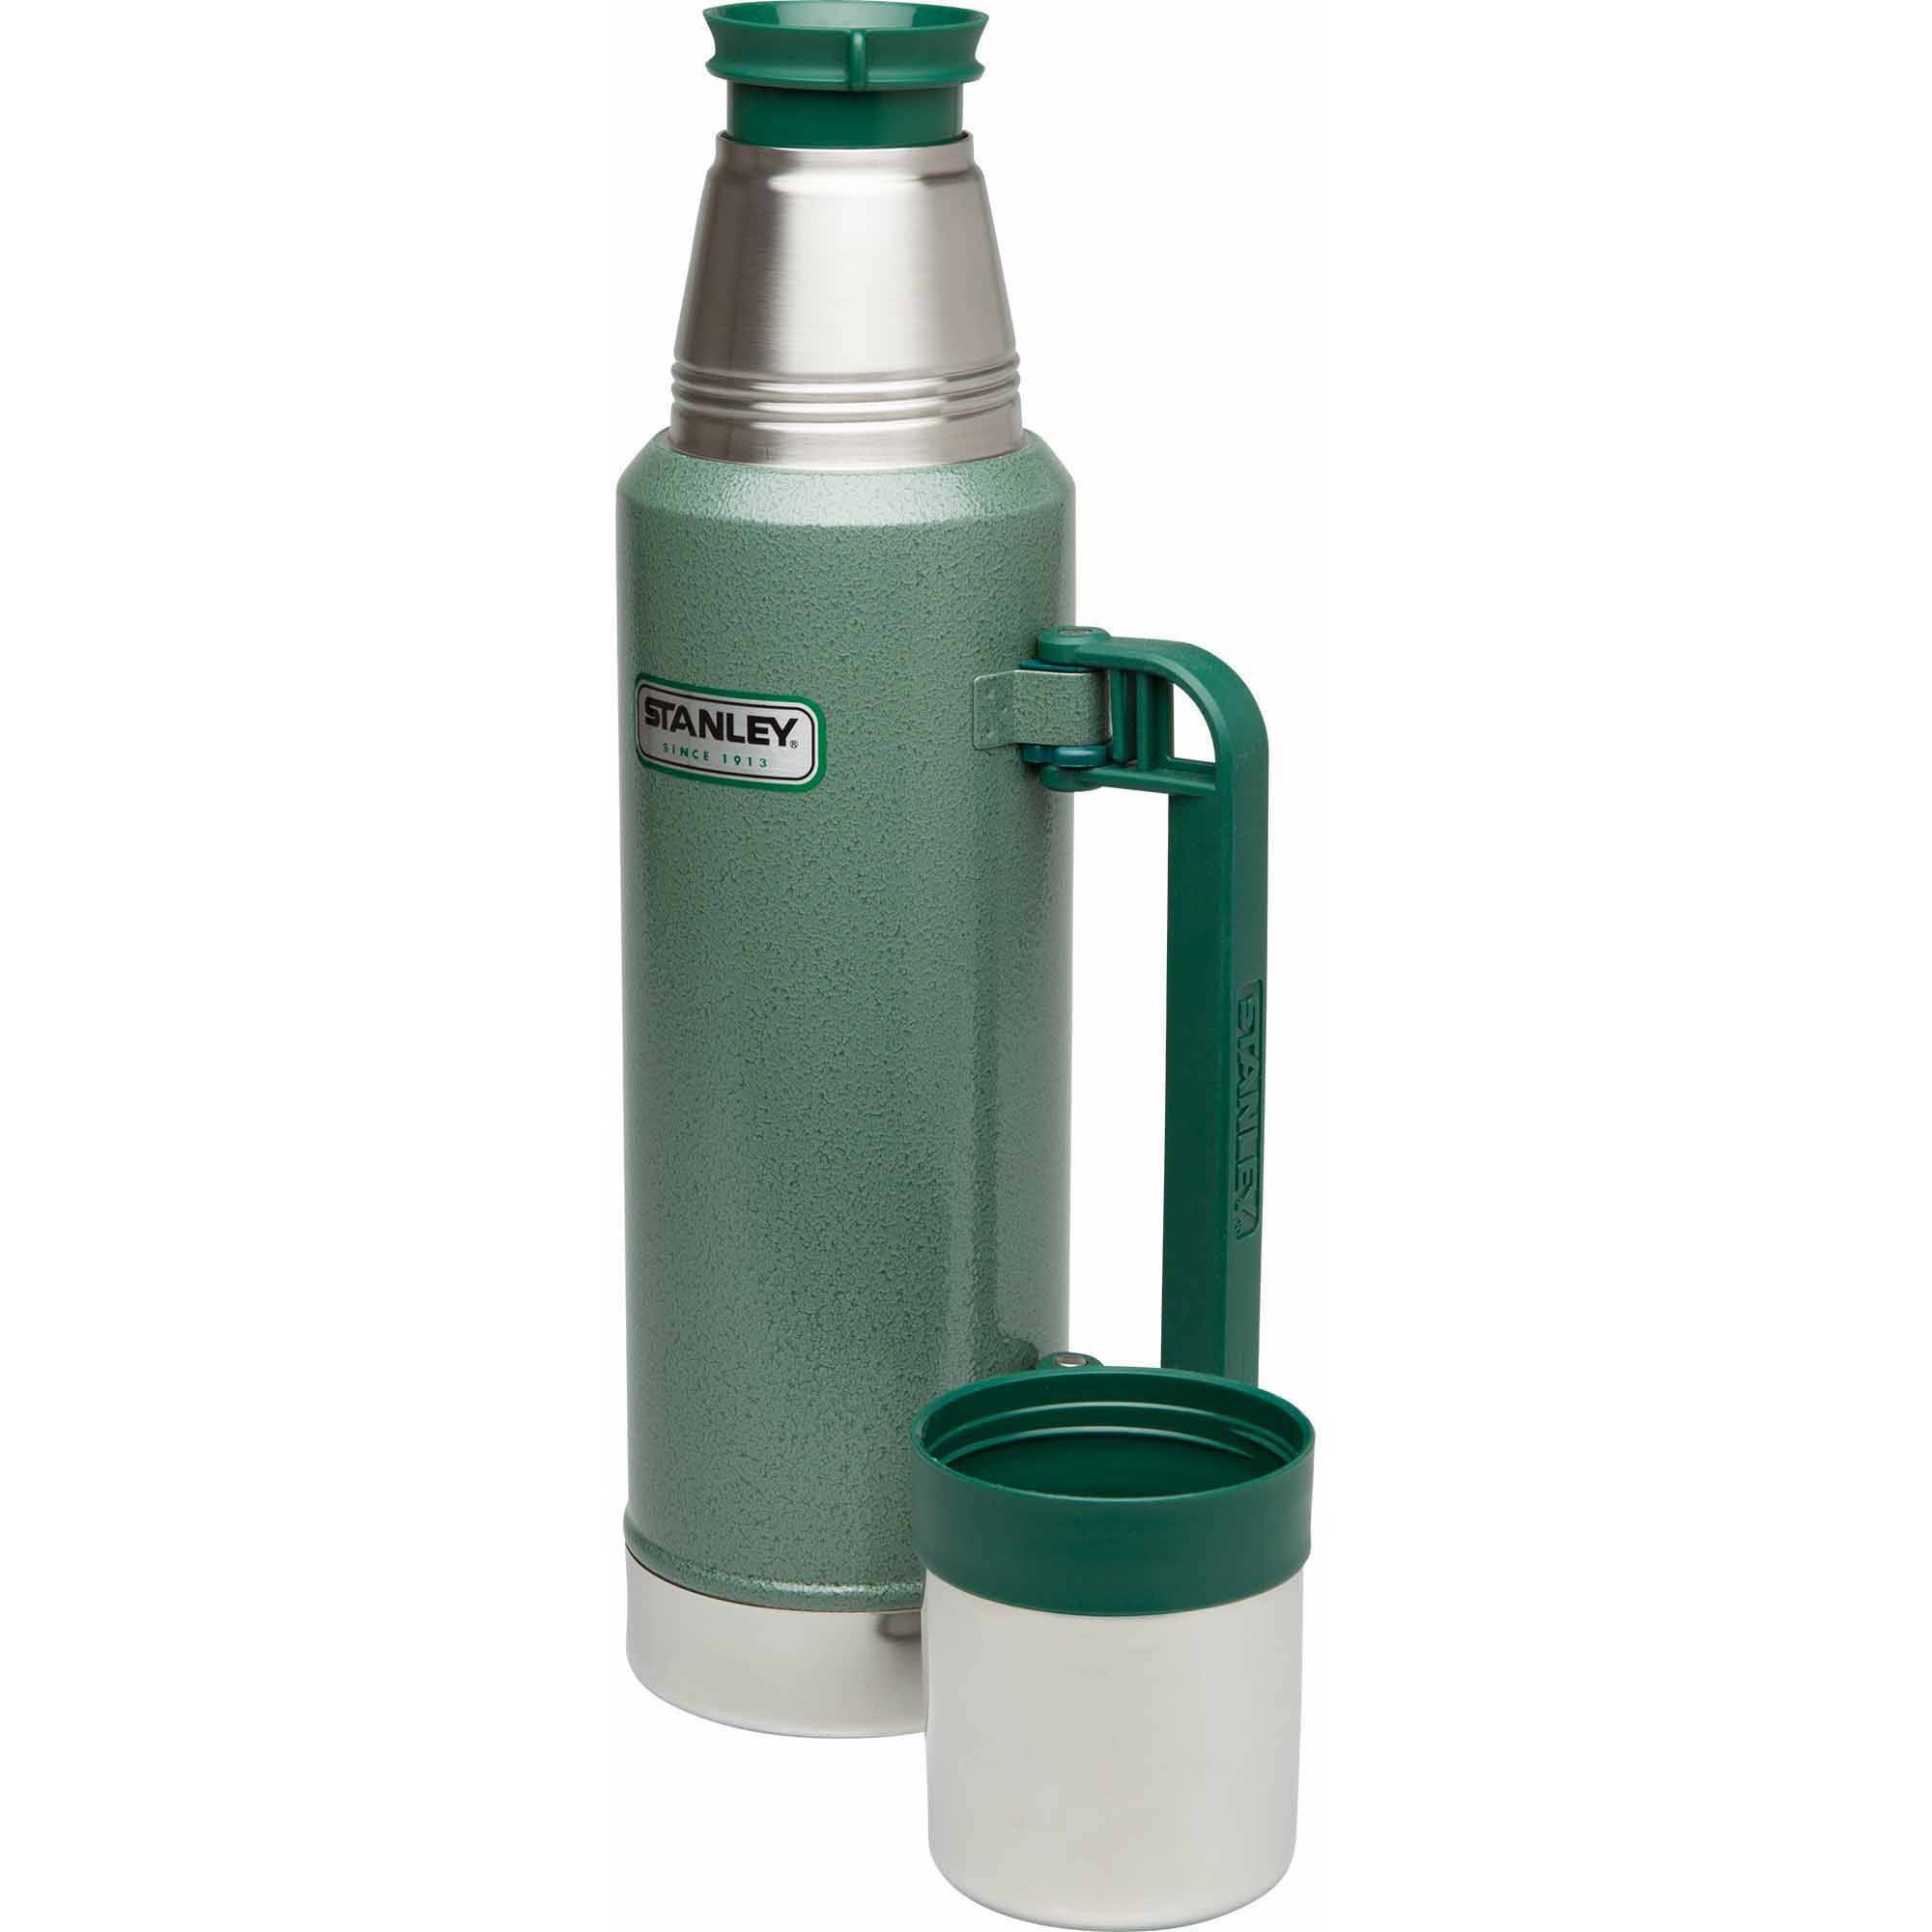 Stanley Classic 1.4 QT Vacuum Bottle - Walmart.com